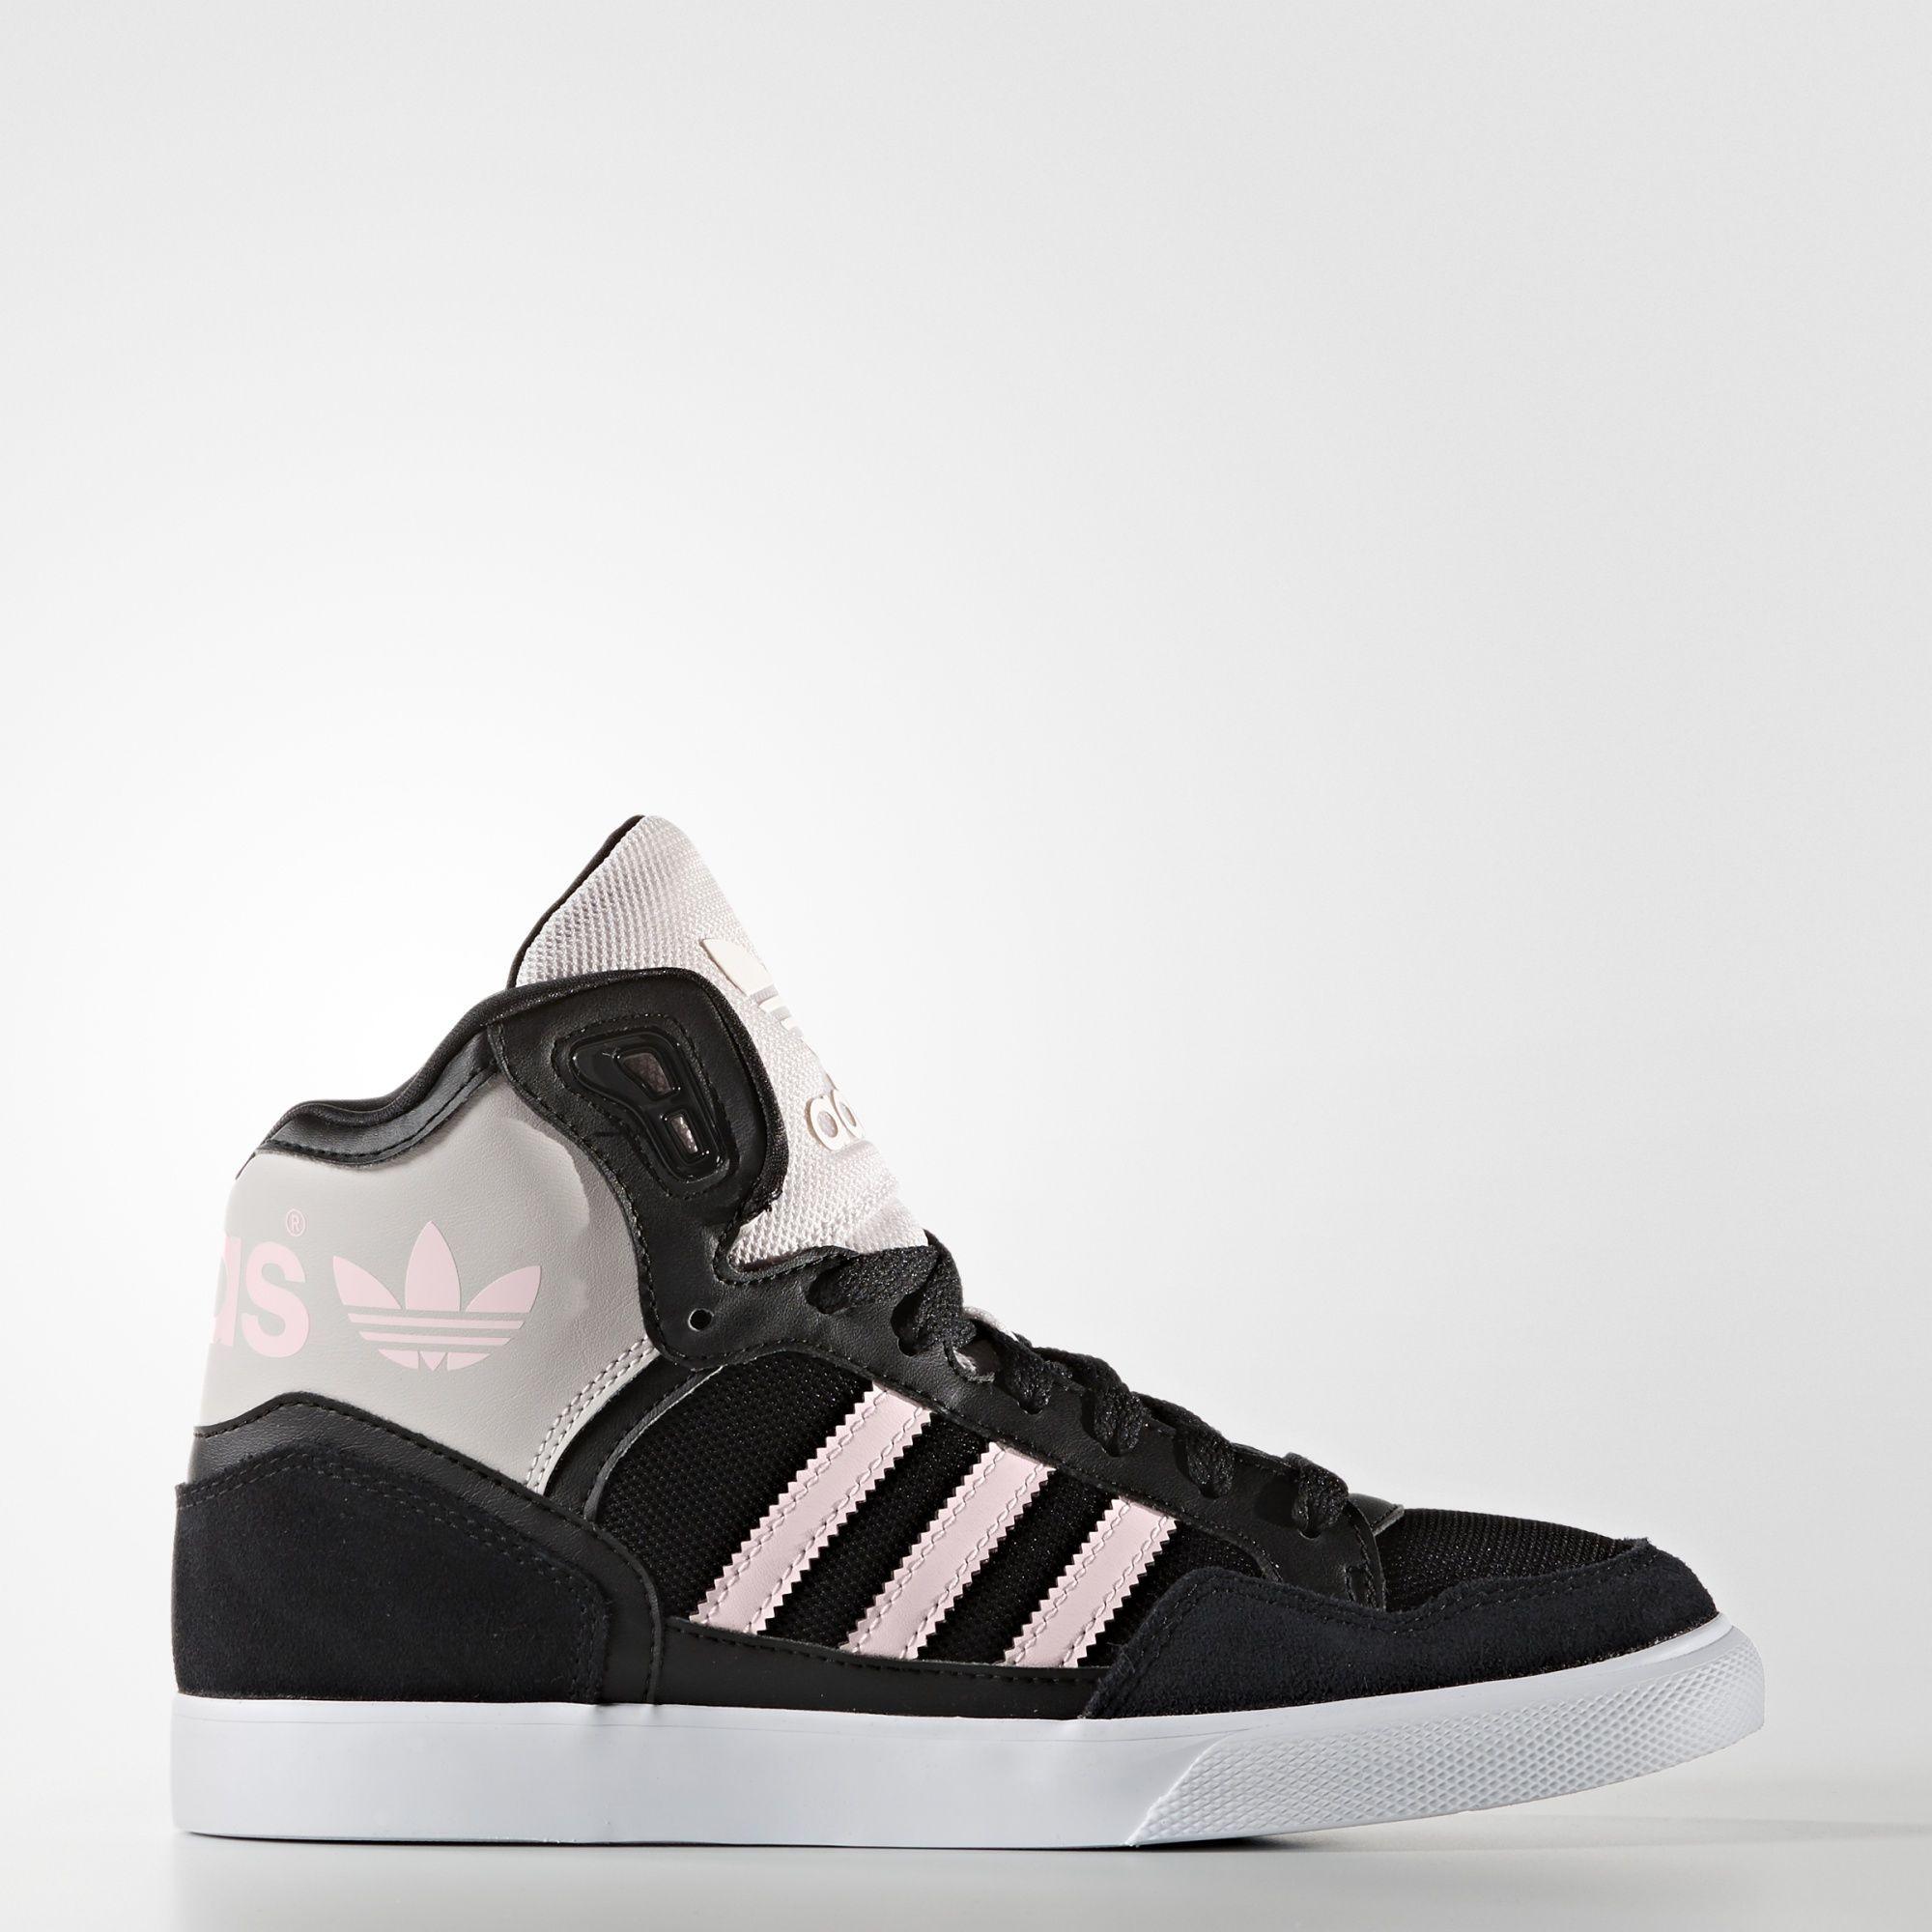 WIdeas Outfits En Adidas 2019 Extaball Zapatillas De IfY7y6bgv